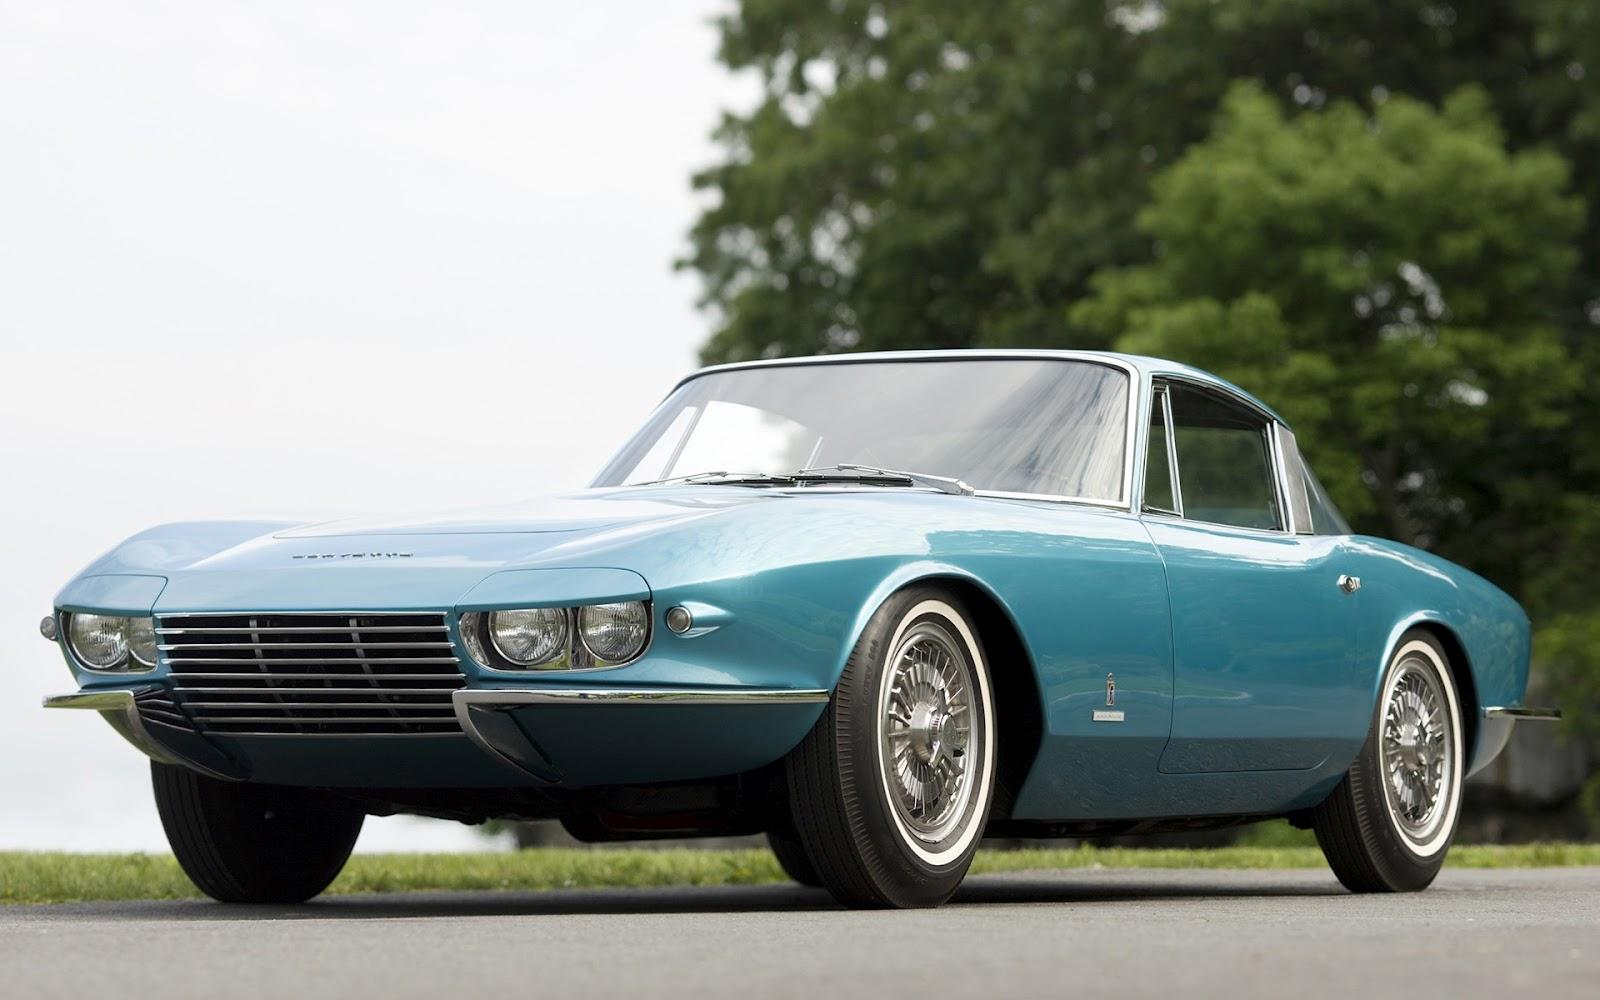 http://1.bp.blogspot.com/-FXfnPLyuLvg/T8OAYnhc54I/AAAAAAAAwrA/c-gU6W0gTjw/s1600/Corvette+C2+Rondine+Coupe+1963.jpg